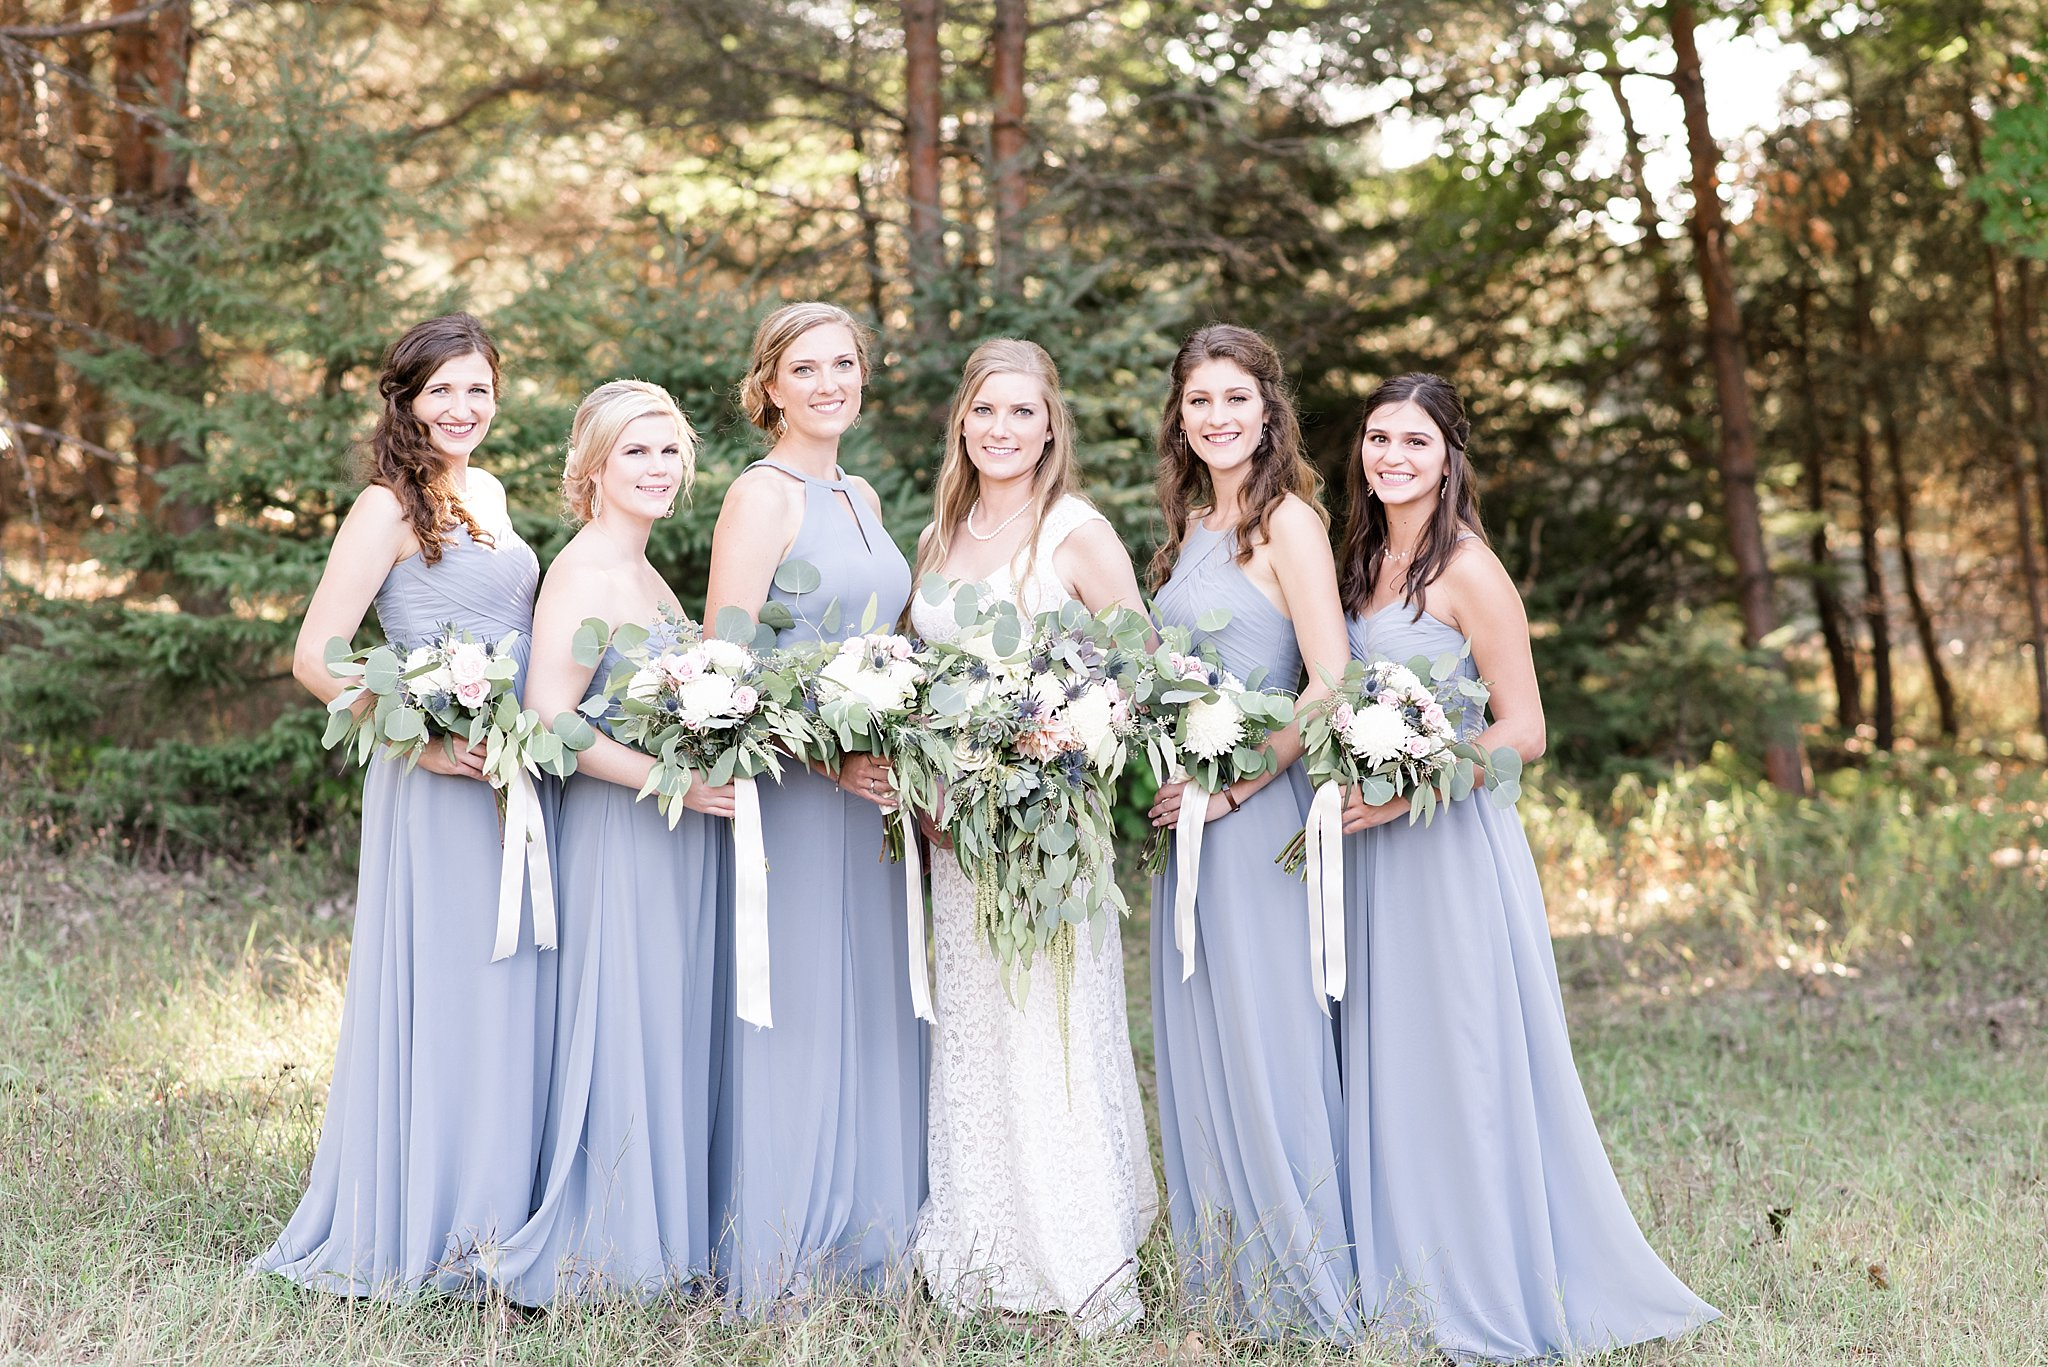 Cadillac-Michigan-wedding-caberfae-peaks-milwaukee-photographer_0048.jpg